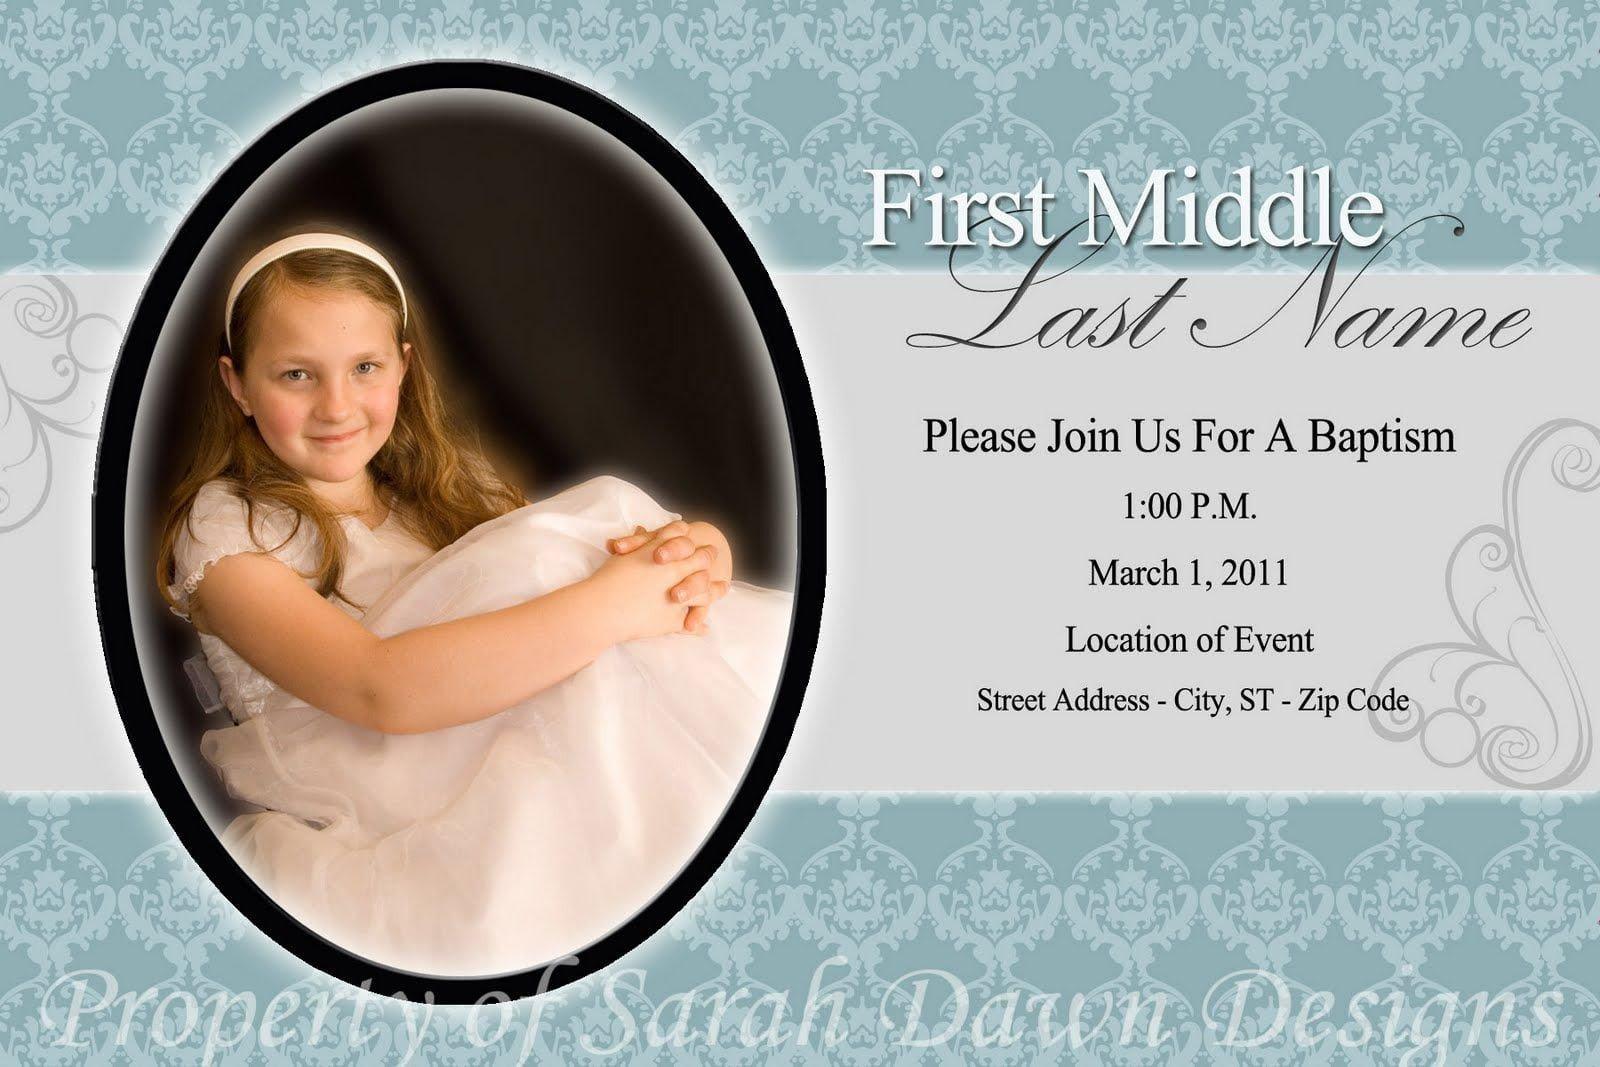 Lds Baptism Invitation Template Lds Baptism Invitation Template Free